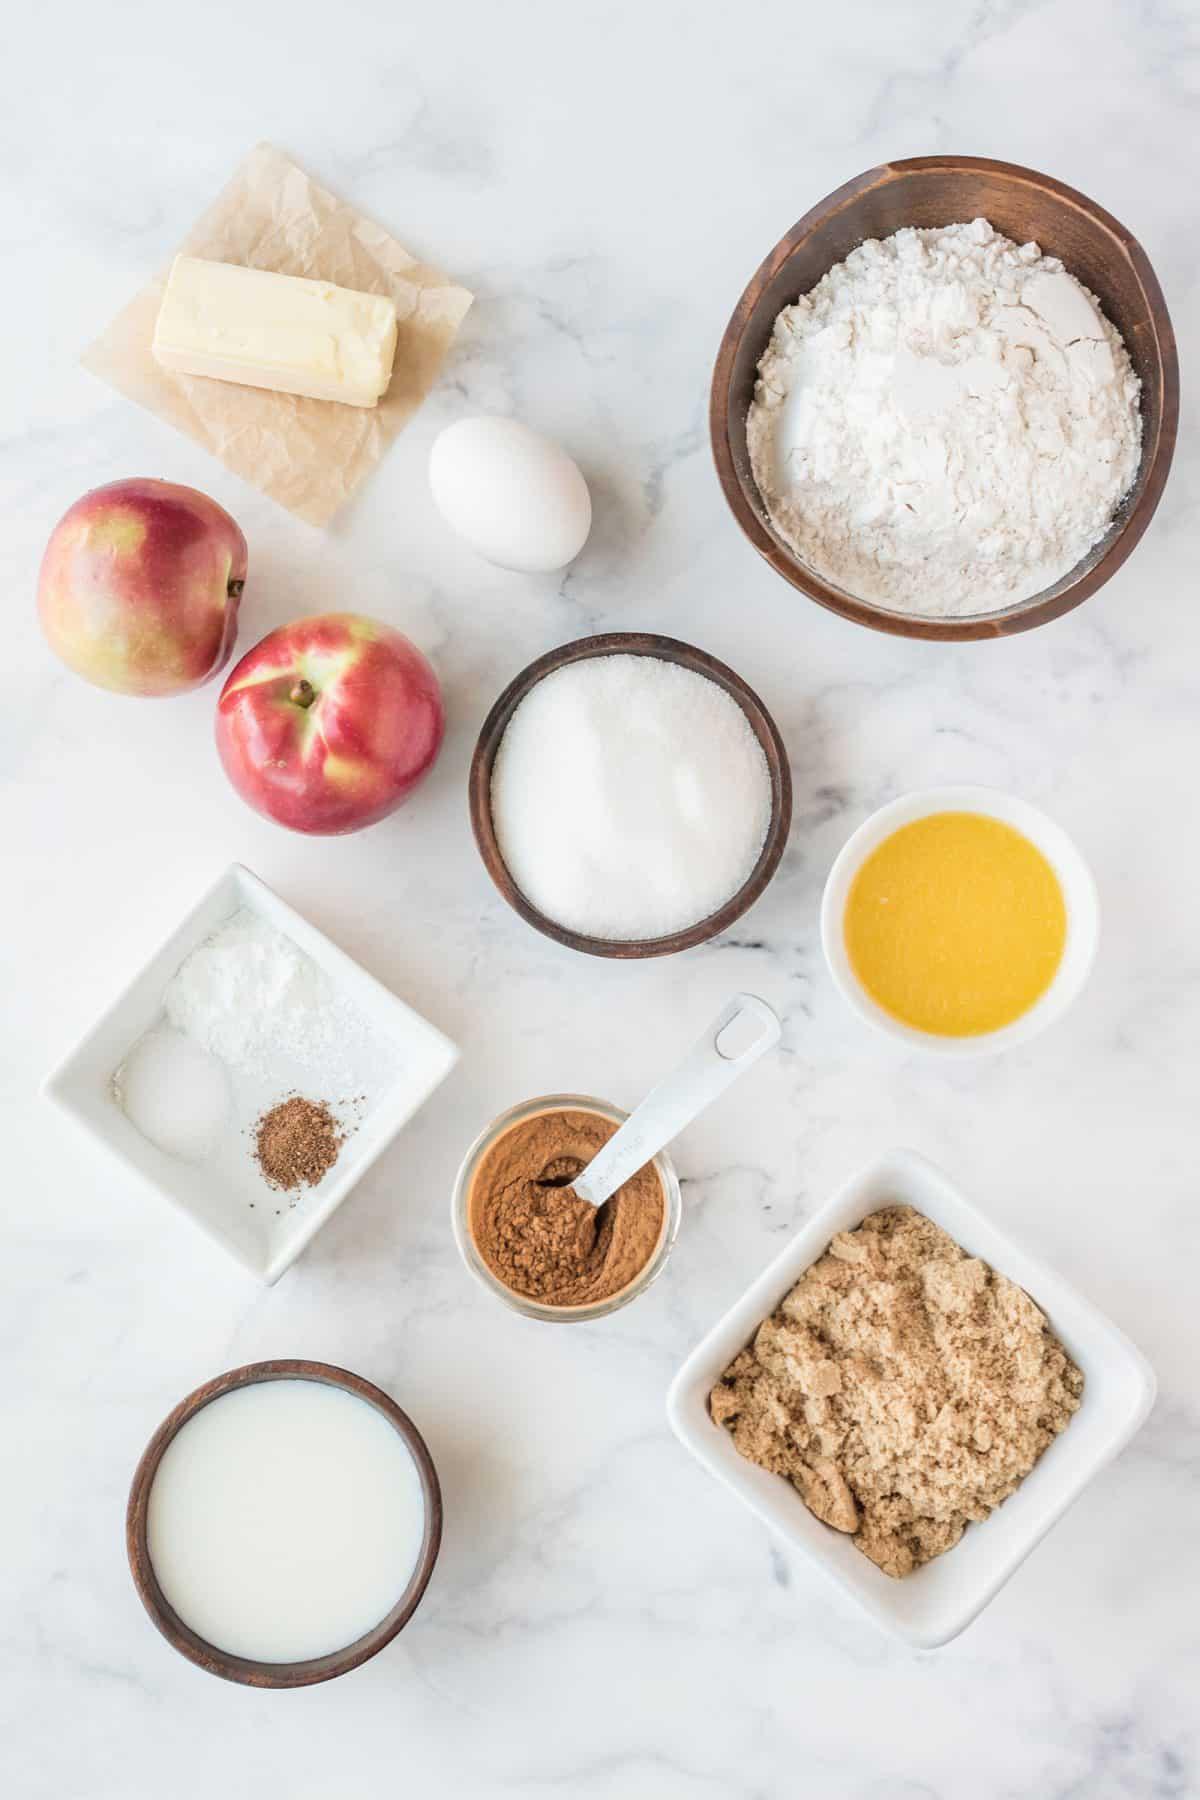 ingredients for apple cinnamon muffins